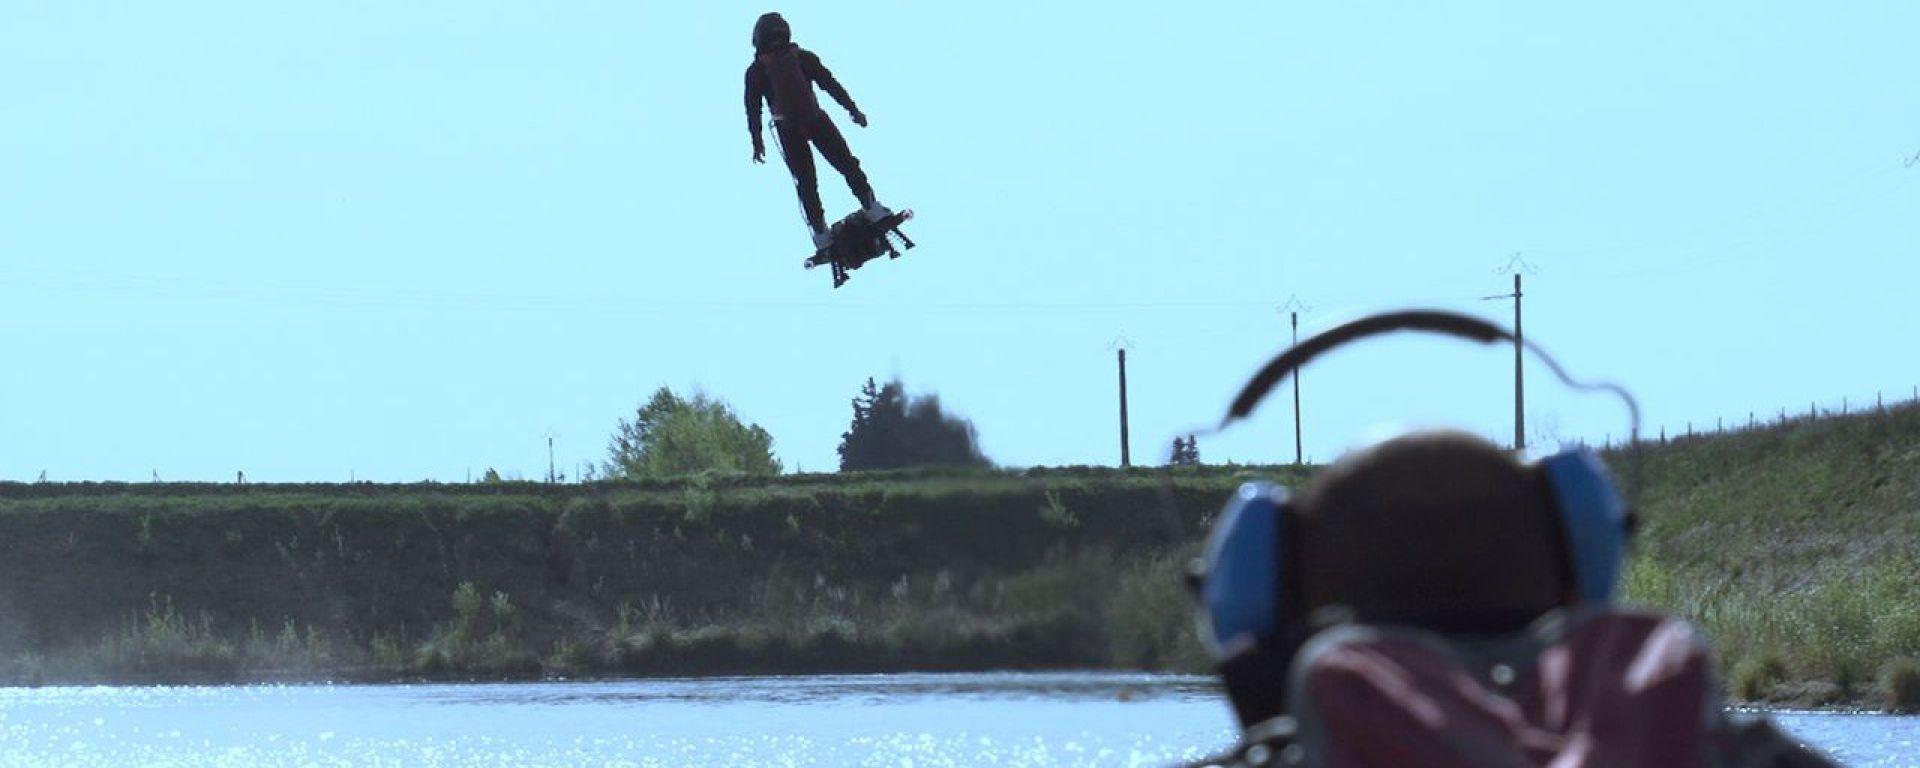 Il Flyboard Air di Zapata Racing entra nel Guinness World Record